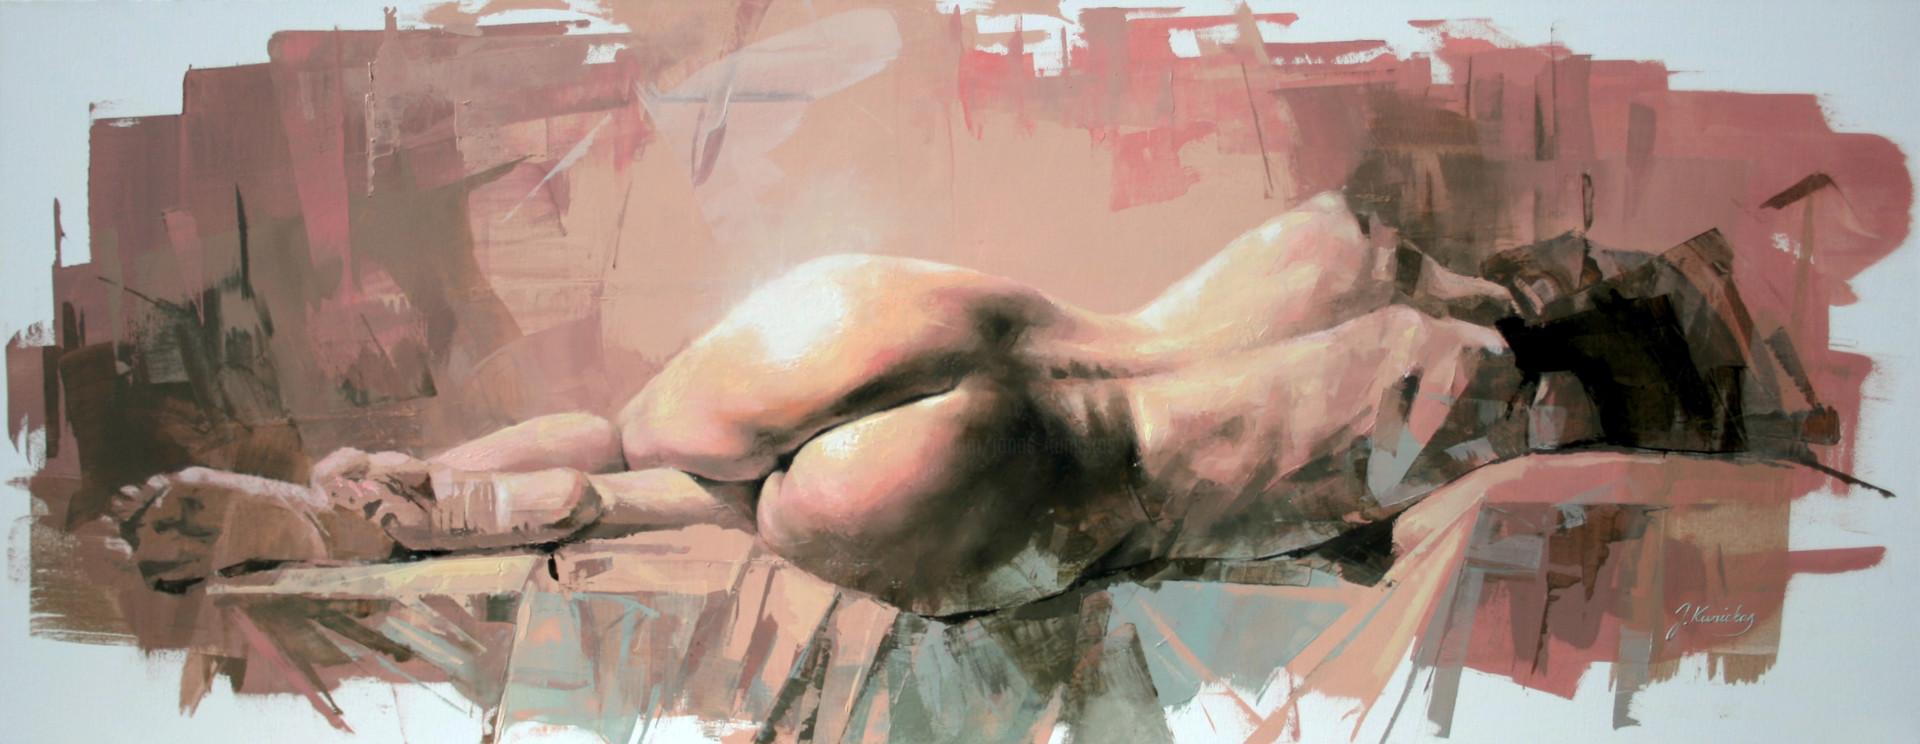 Jonas Kunickas - JK19-0820 Skin